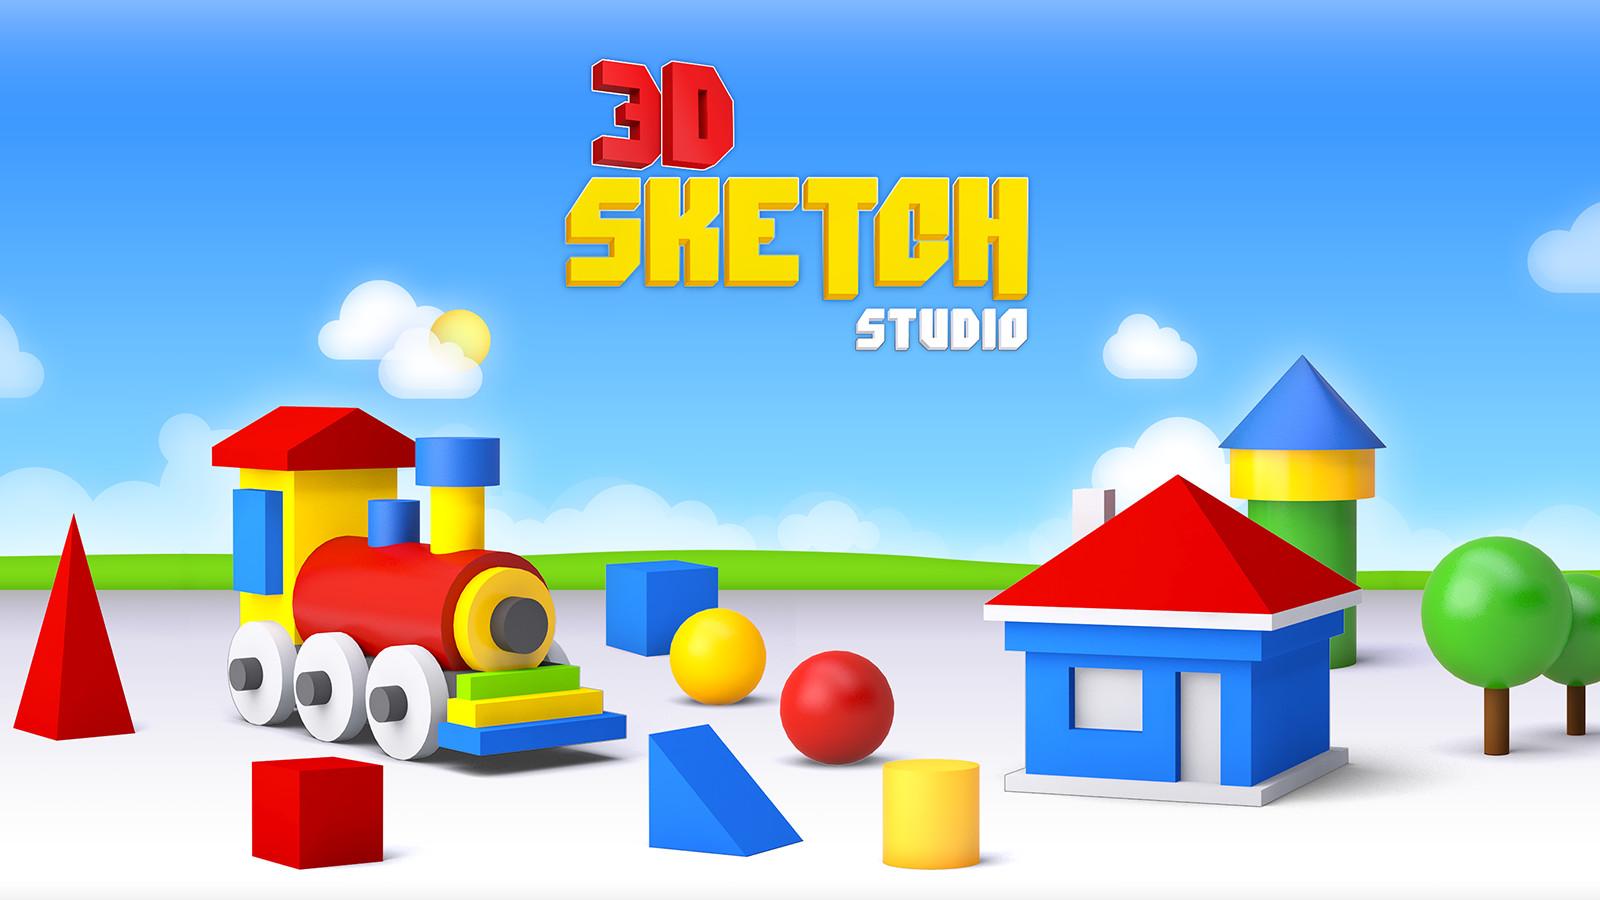 3D Sketch Studio